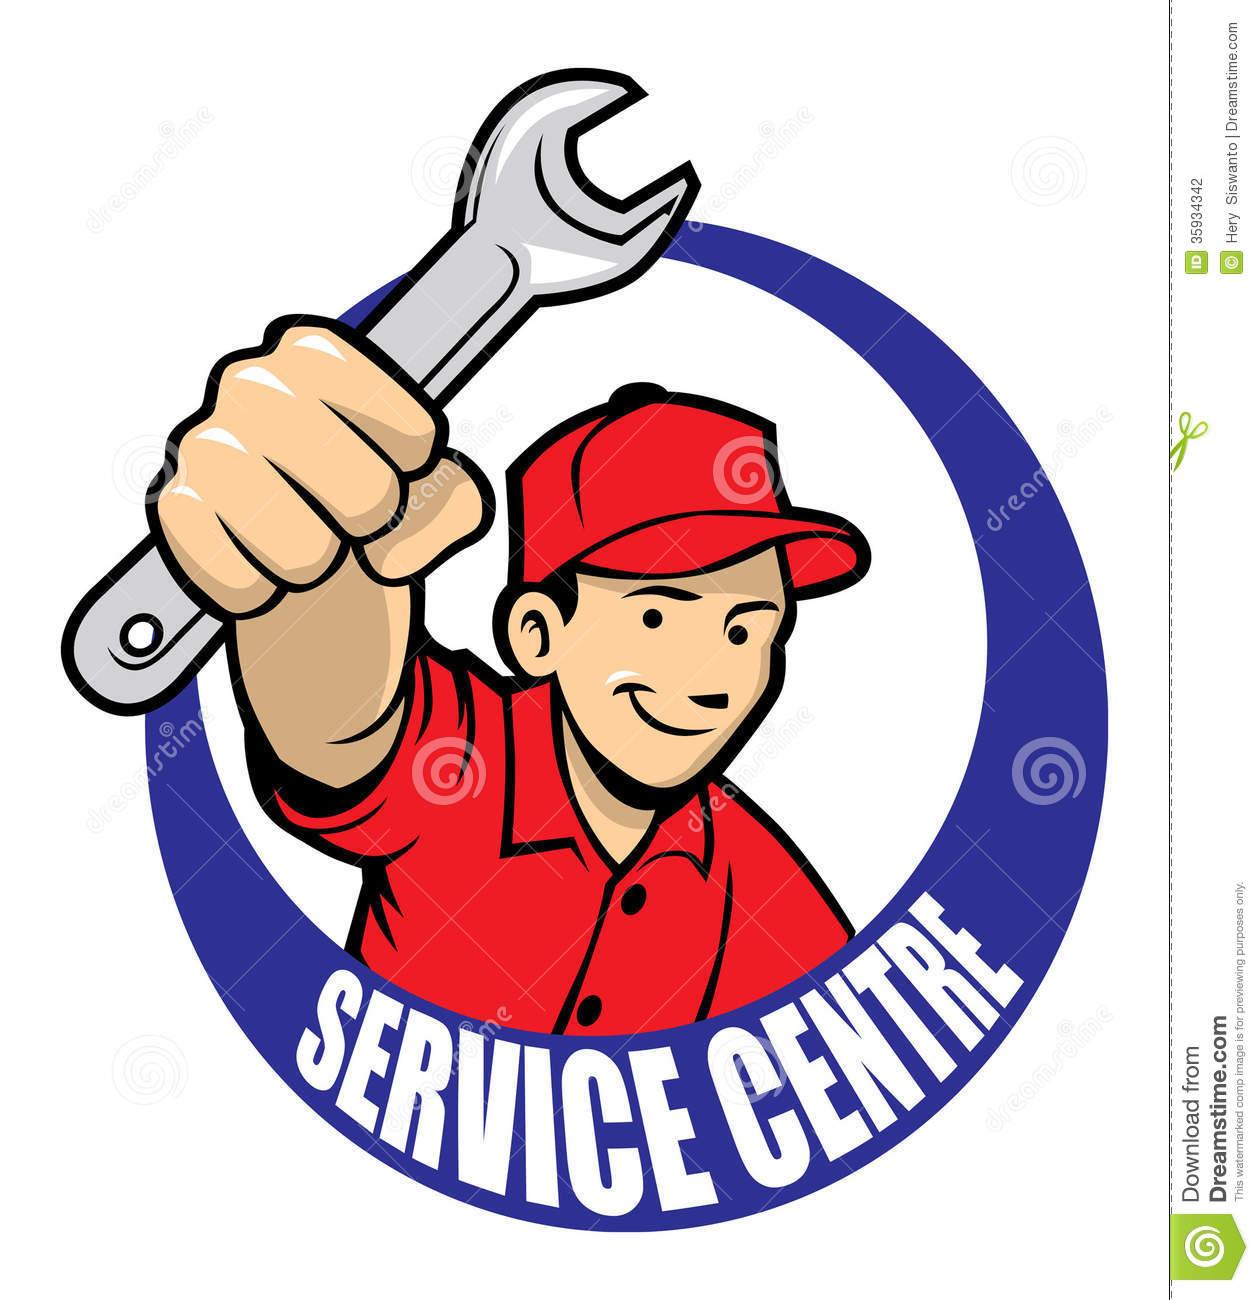 free clipart maintenance worker - photo #26